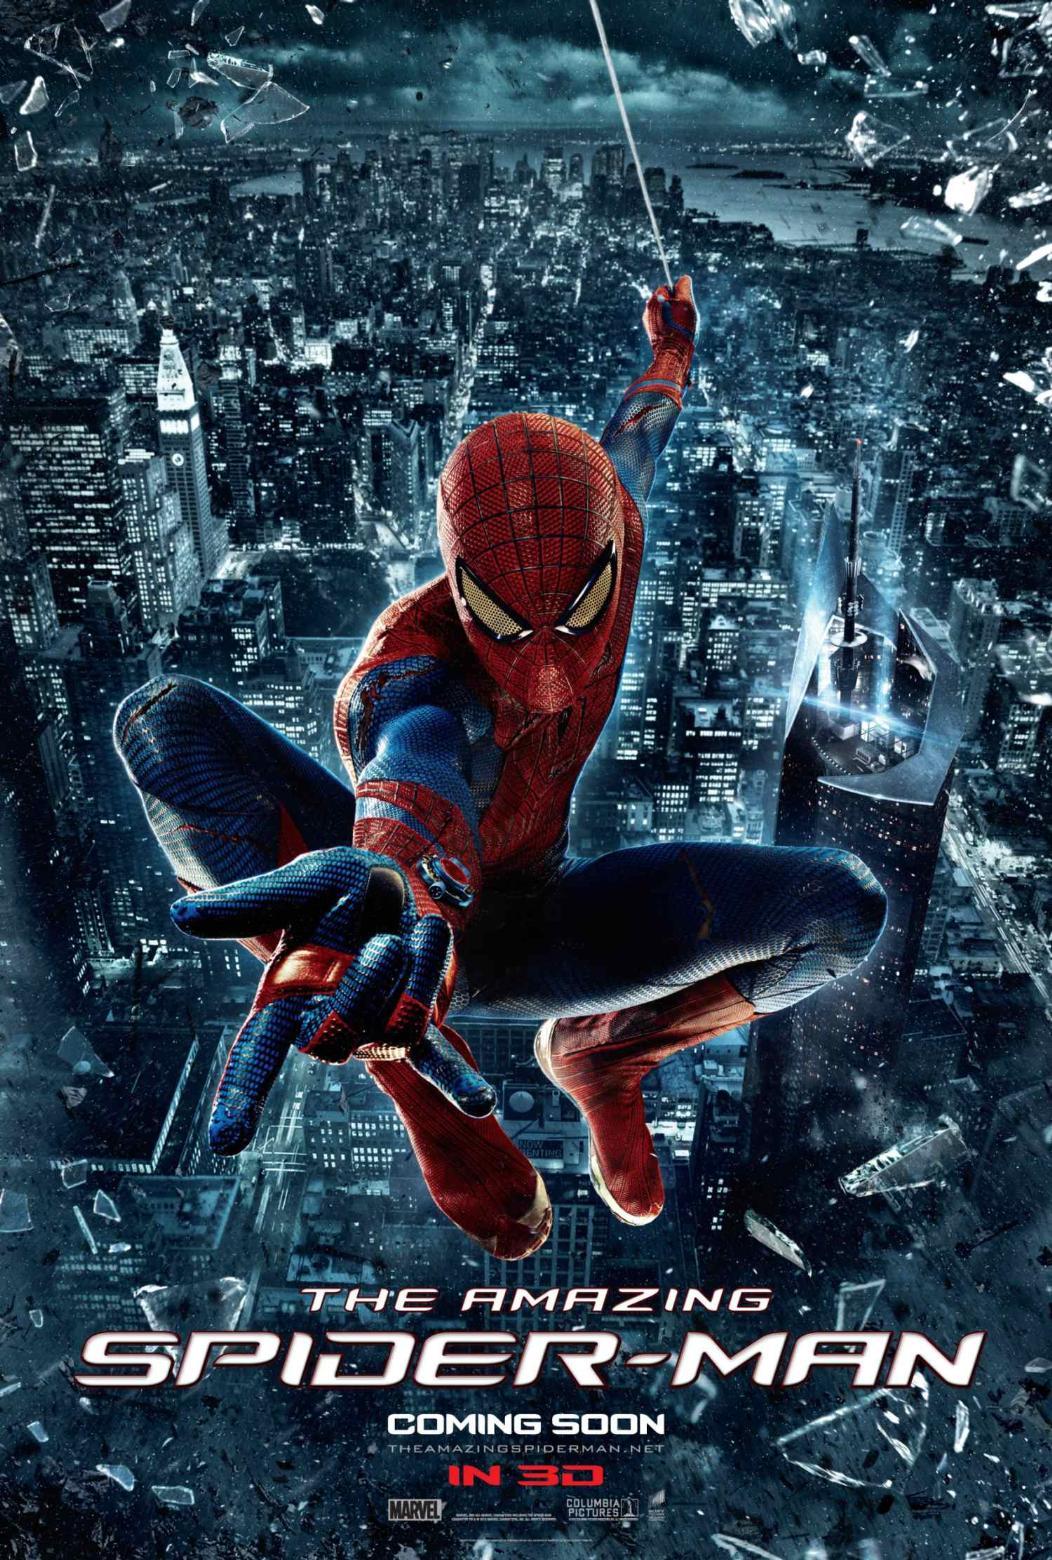 amazing spiderman spider movie poster film movies posters beyond series